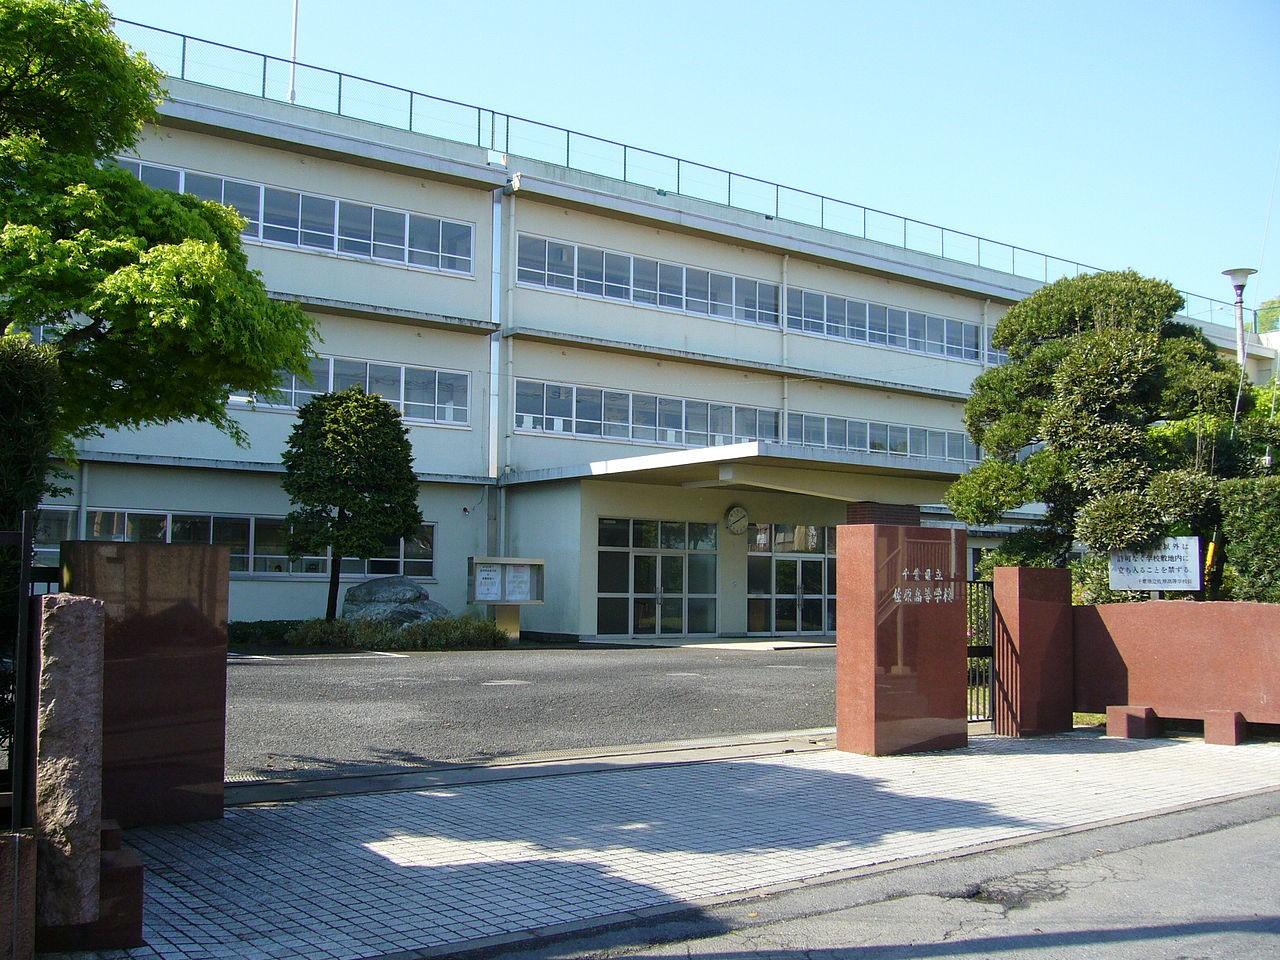 1280px-Sawara-high-school,katori-city,japan